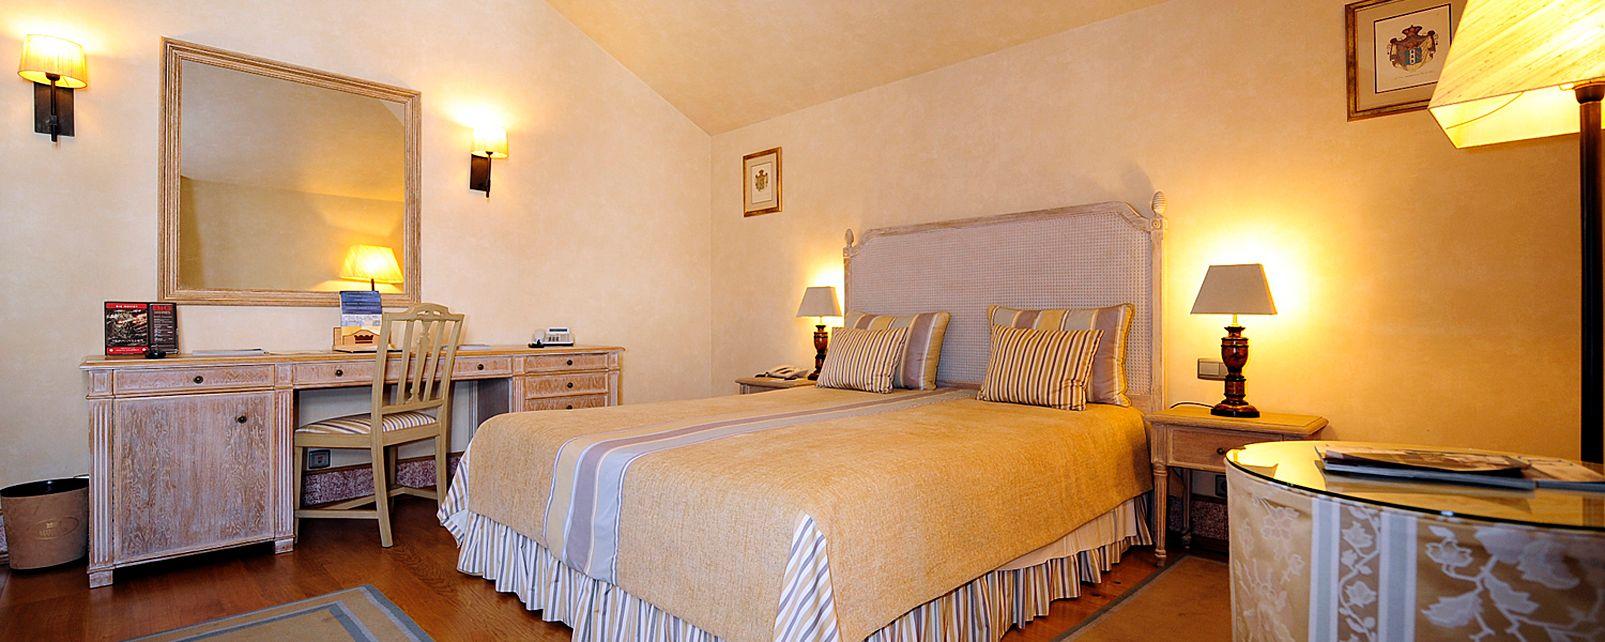 Hotel Real Palacio Lissabon Bewertungen